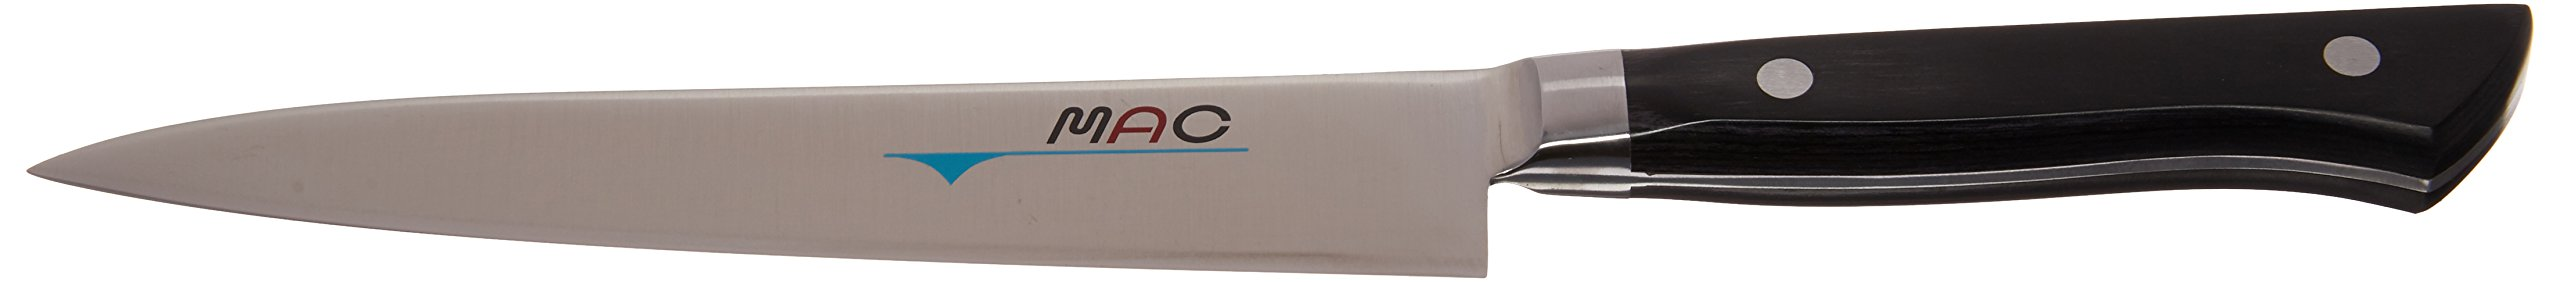 Mac Knife Professional Utility Knife, 6-Inch by Mac Knife